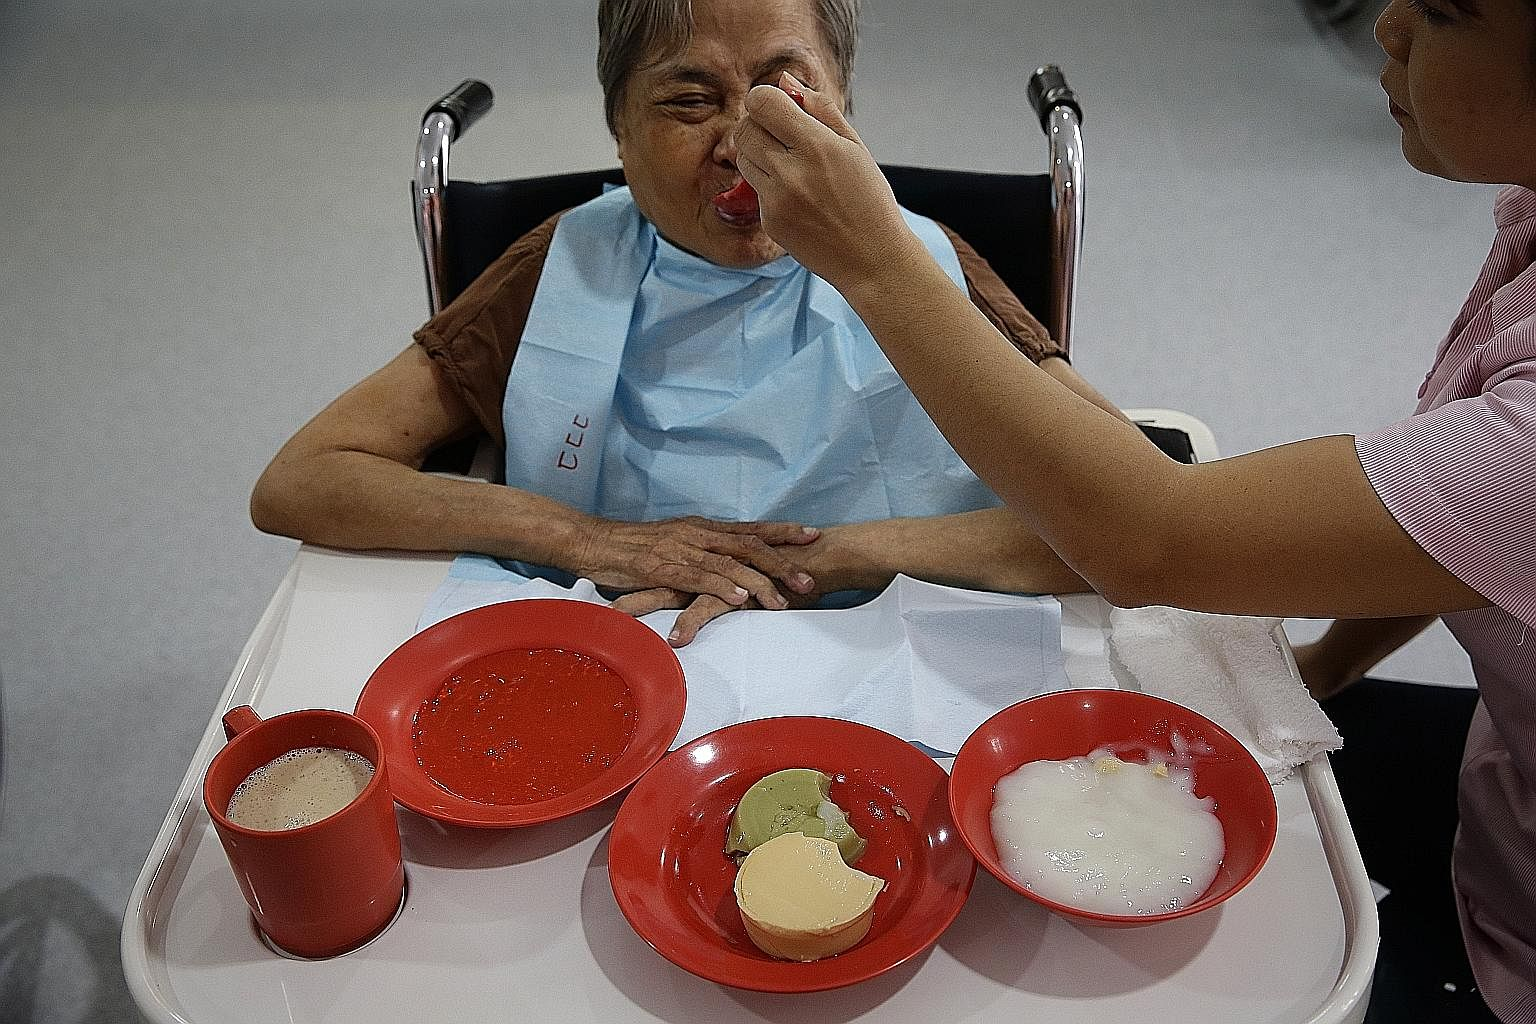 Elder friendly meals anyone singapore news top stories the elder friendly meals anyone singapore news top stories the straits times forumfinder Choice Image